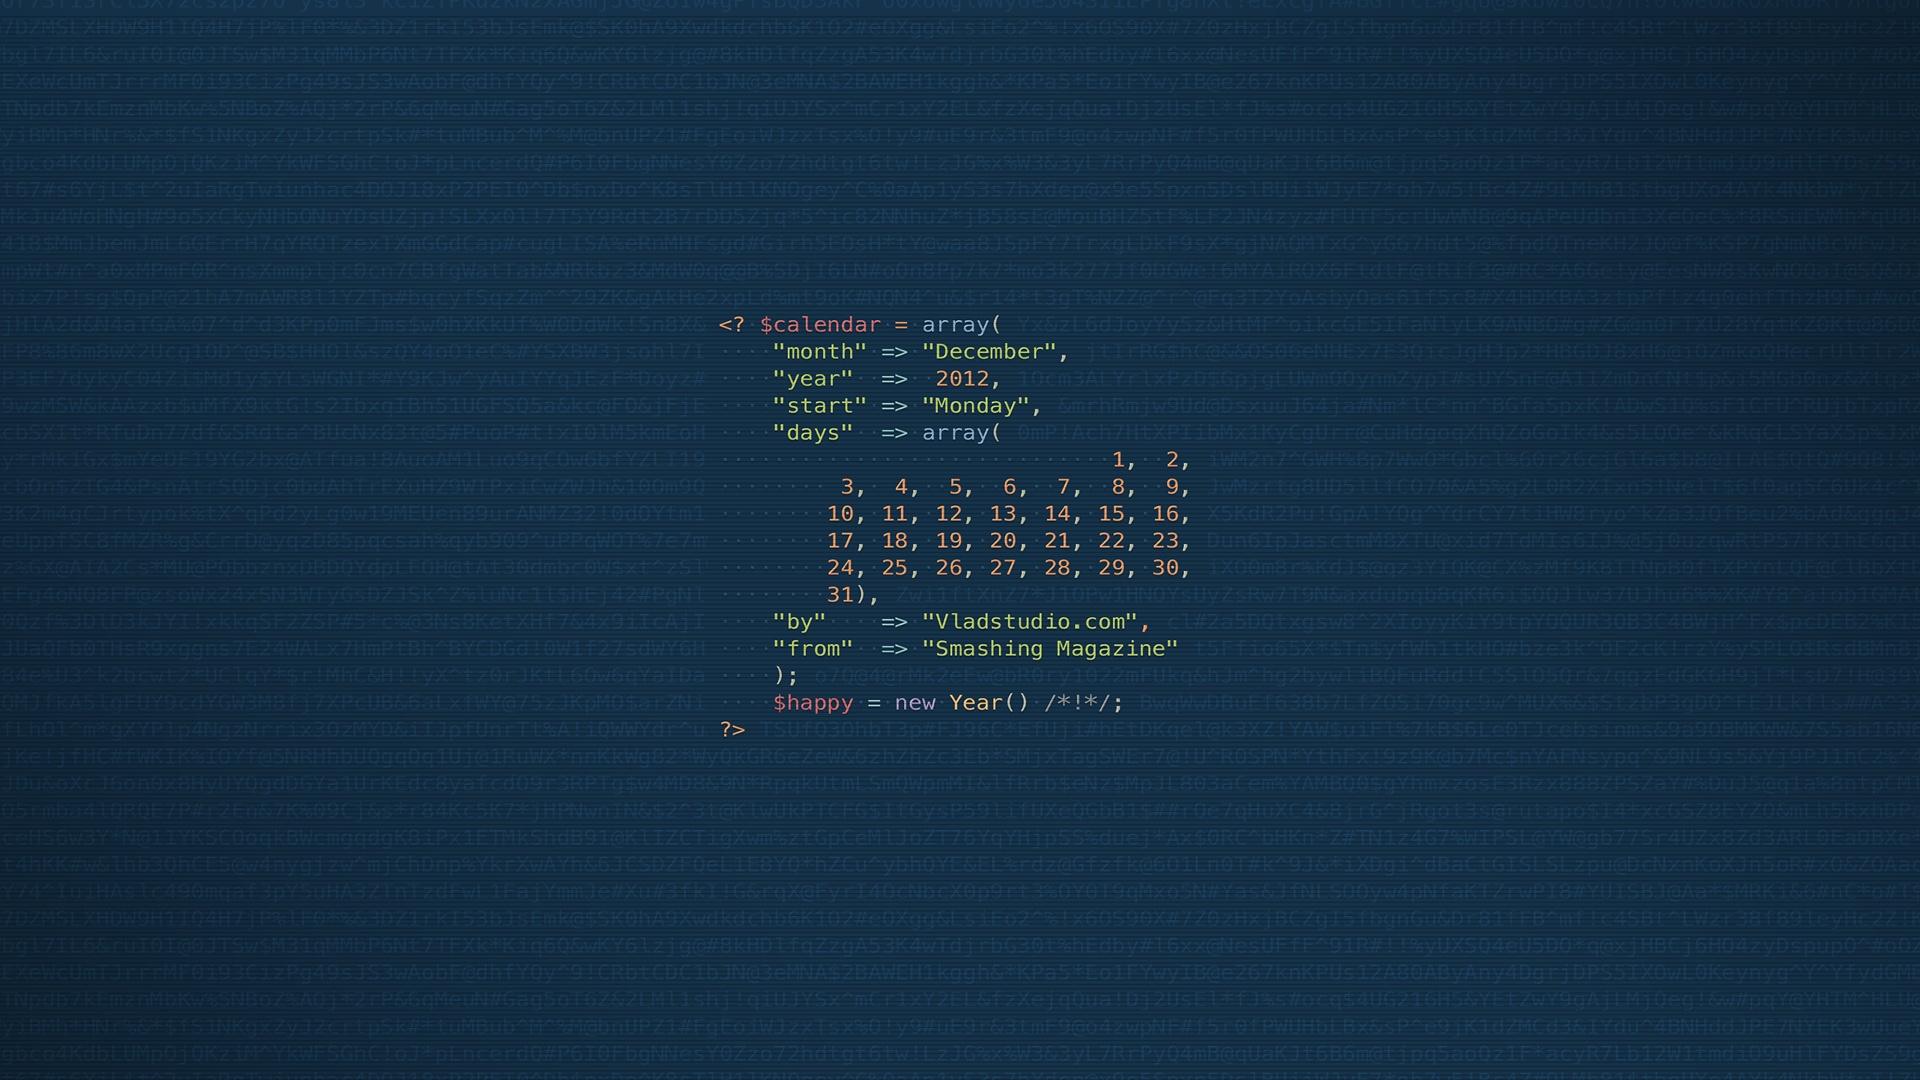 Desktop Wallpaper Calendar December 2012 推酷